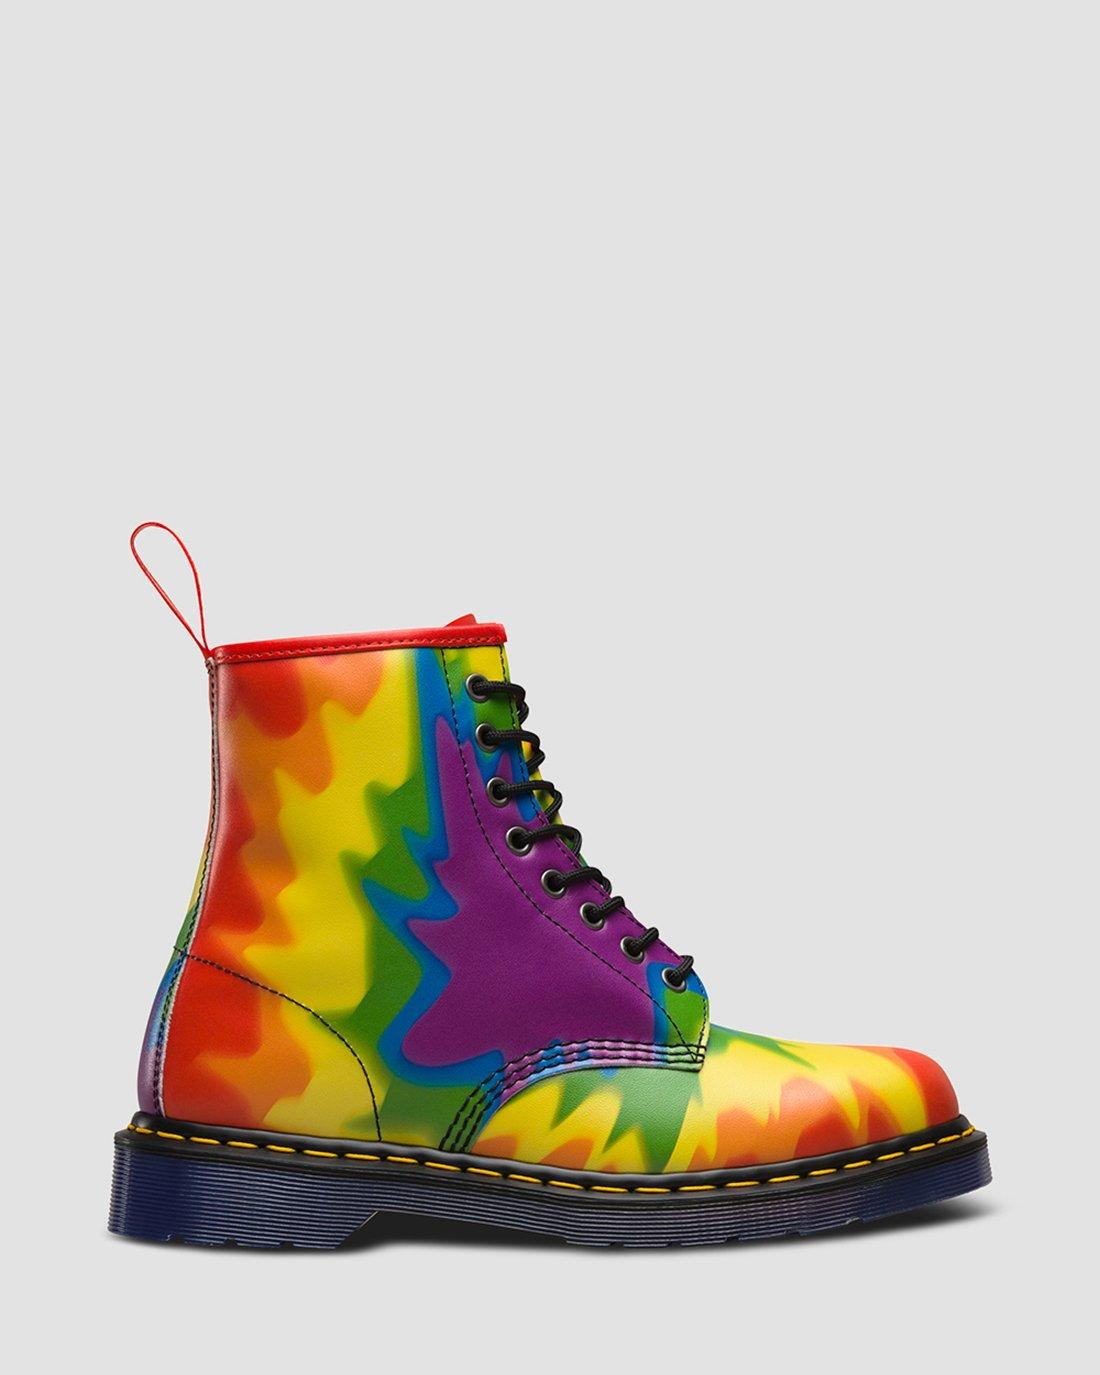 DR MARTENS 1460 PRIDE MULTI PRIDE TYE DYE BACKHAND Boots In